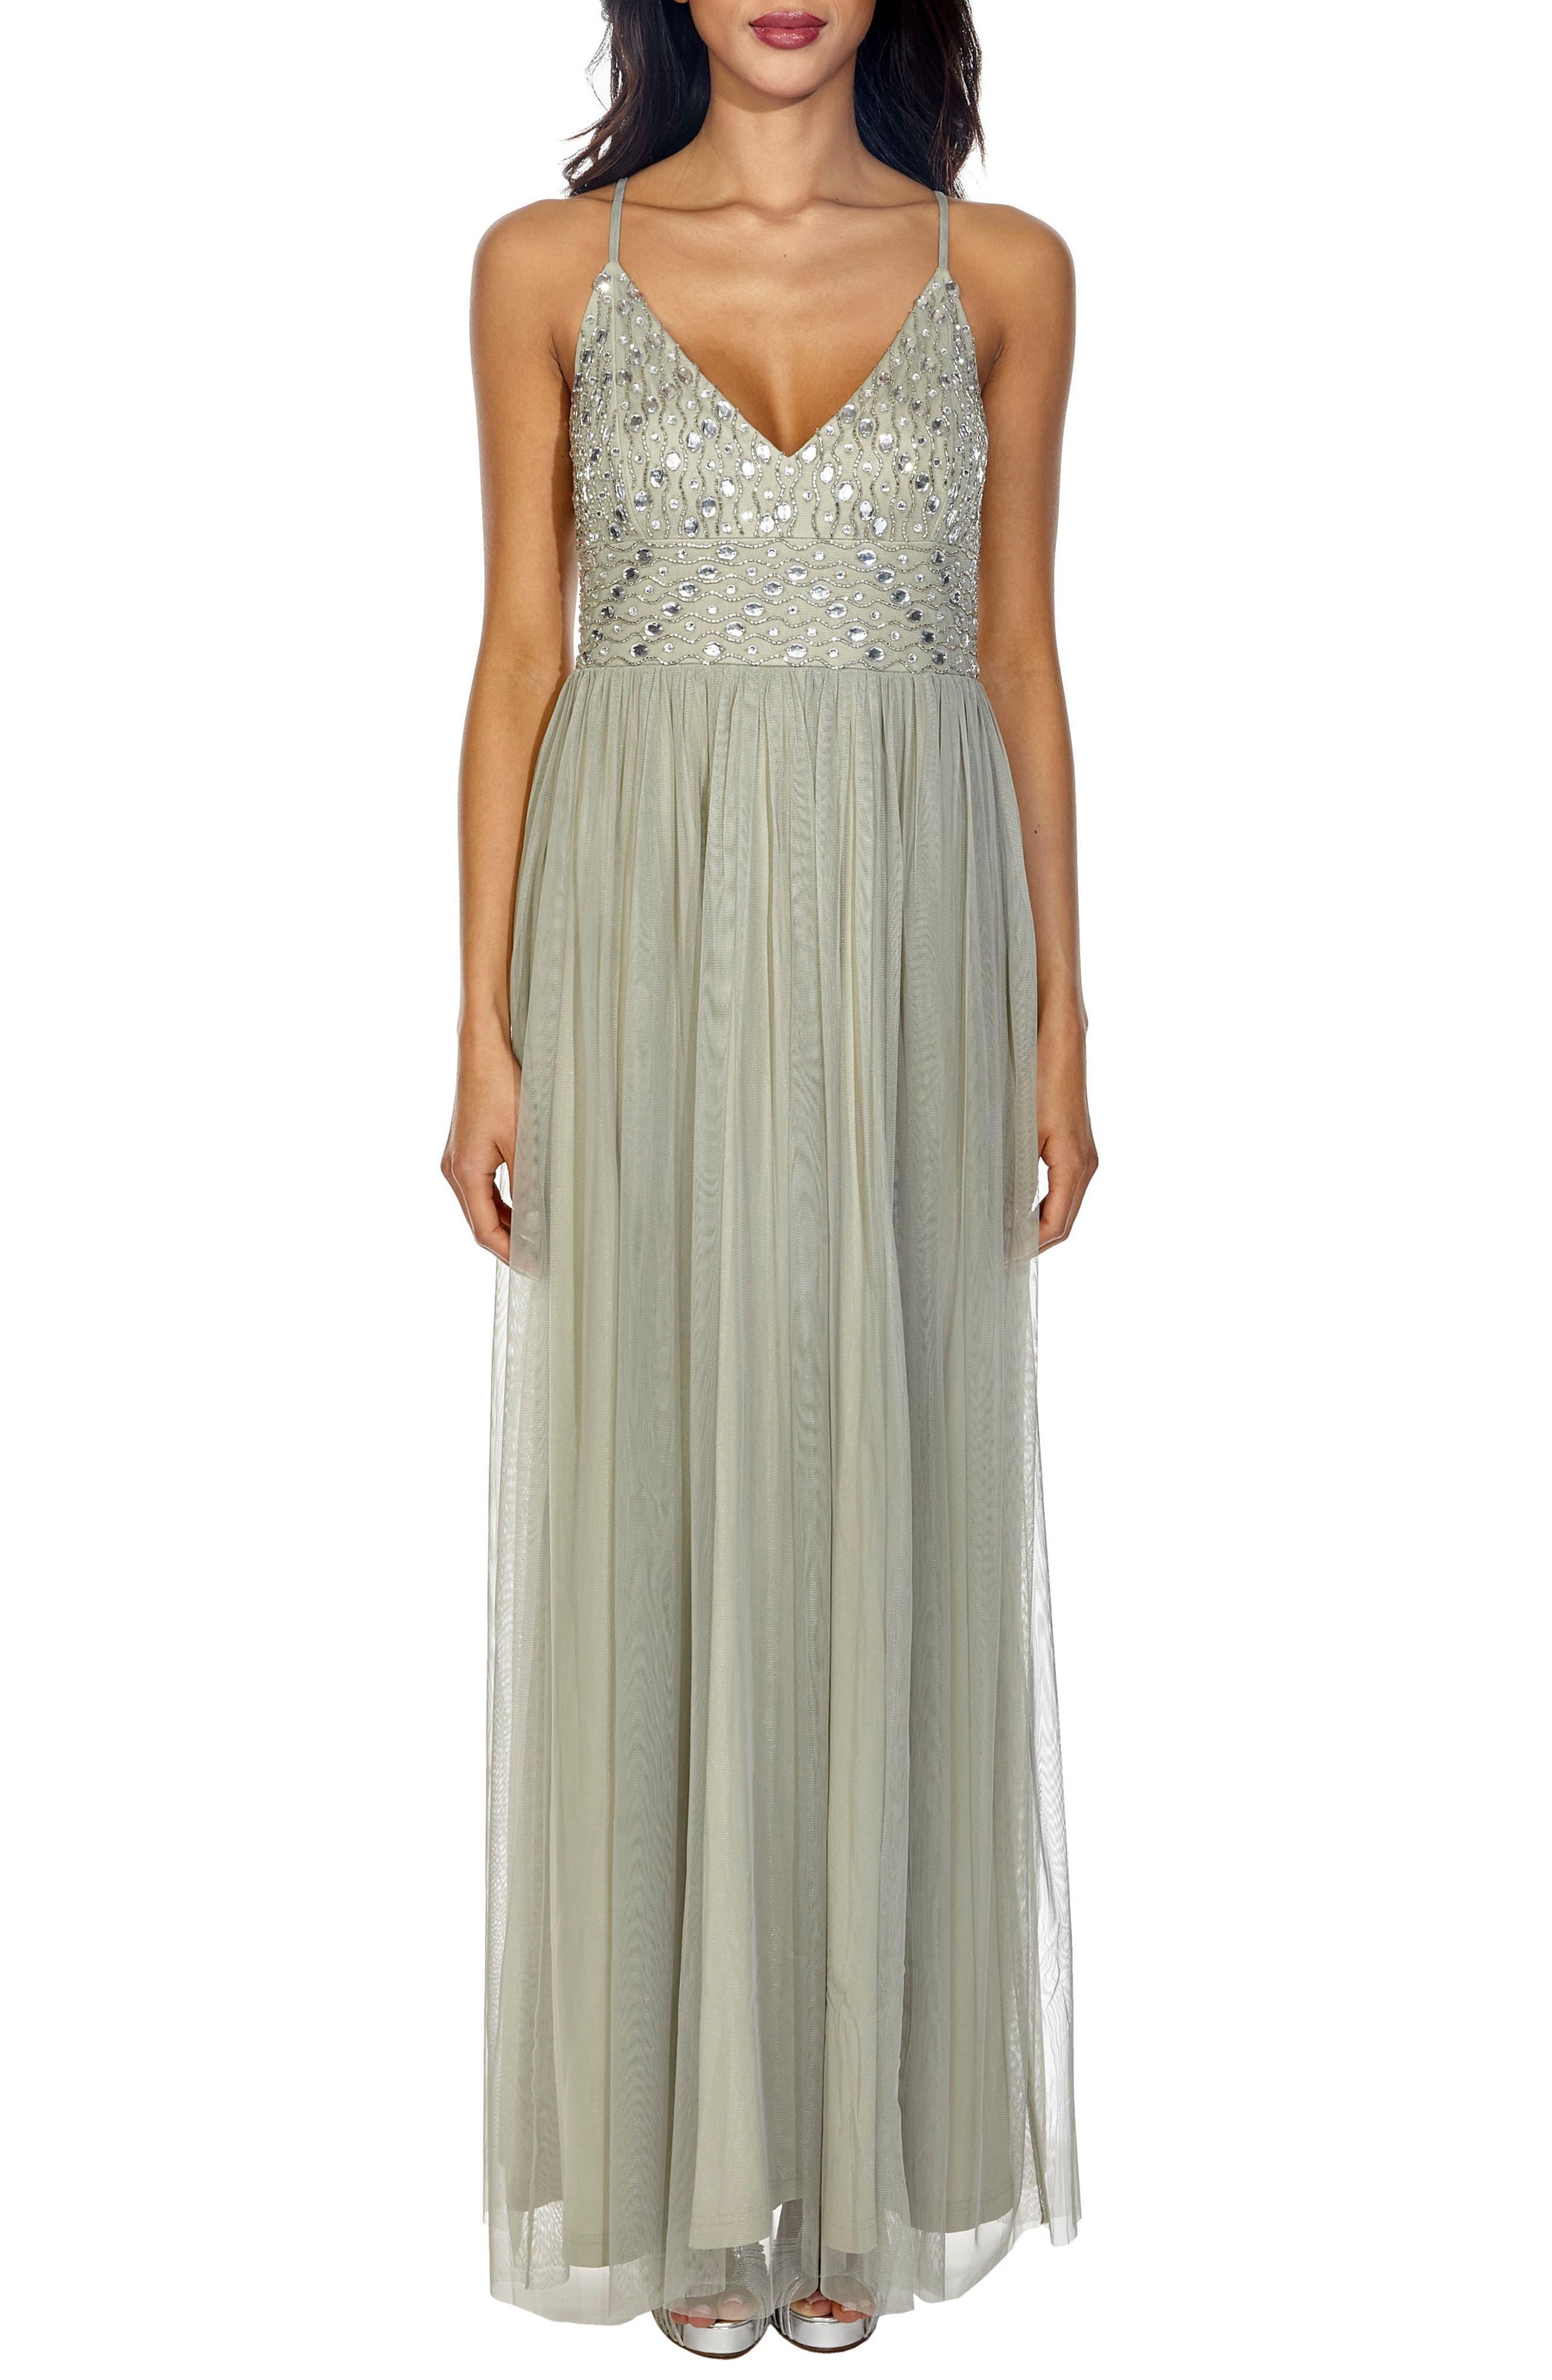 Maeve Beaded Maxi Dress,                             Main thumbnail 1, color,                             330